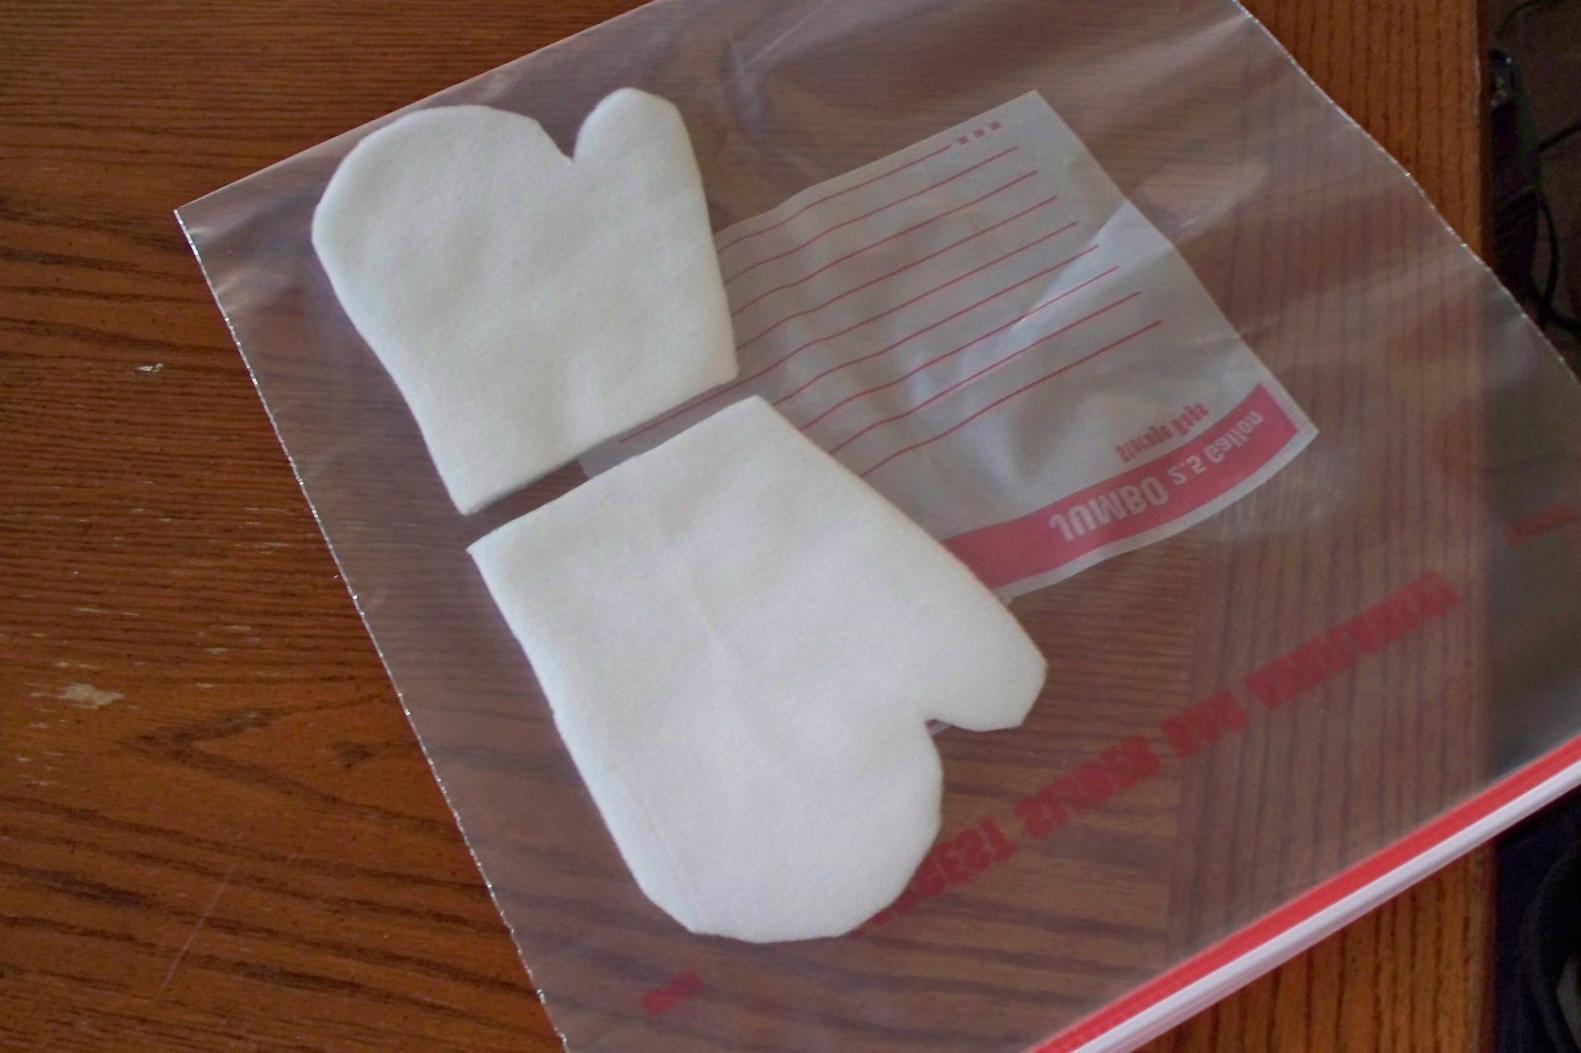 Mitten inserted in plastic